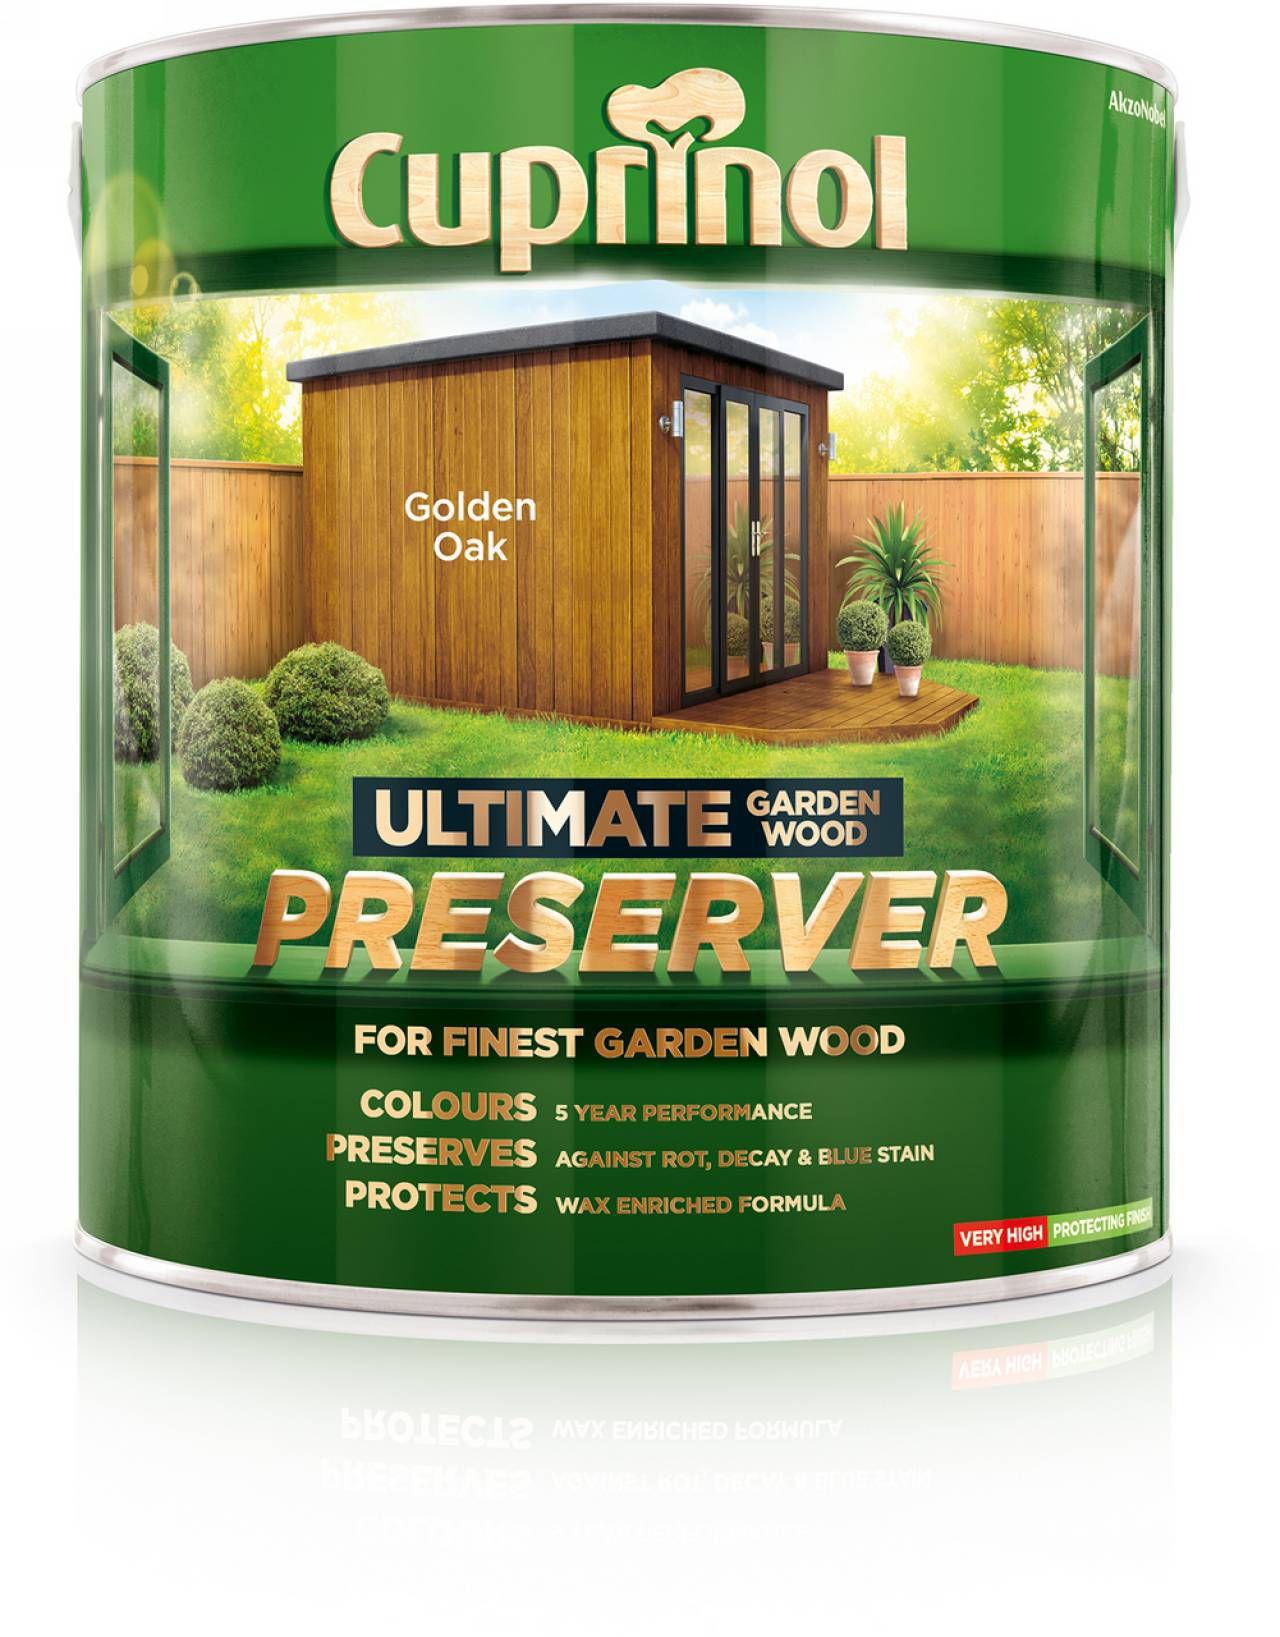 Cuprinol Ultimate Golden Oak Matt Garden Wood Preserver